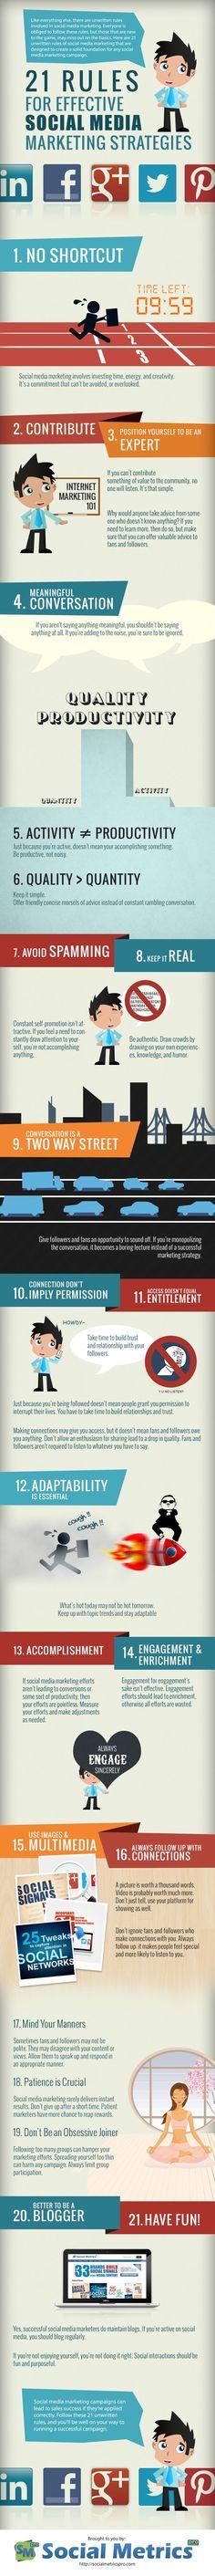 Social Media Marketing Strategies #Infographic #socialmedia #marketing